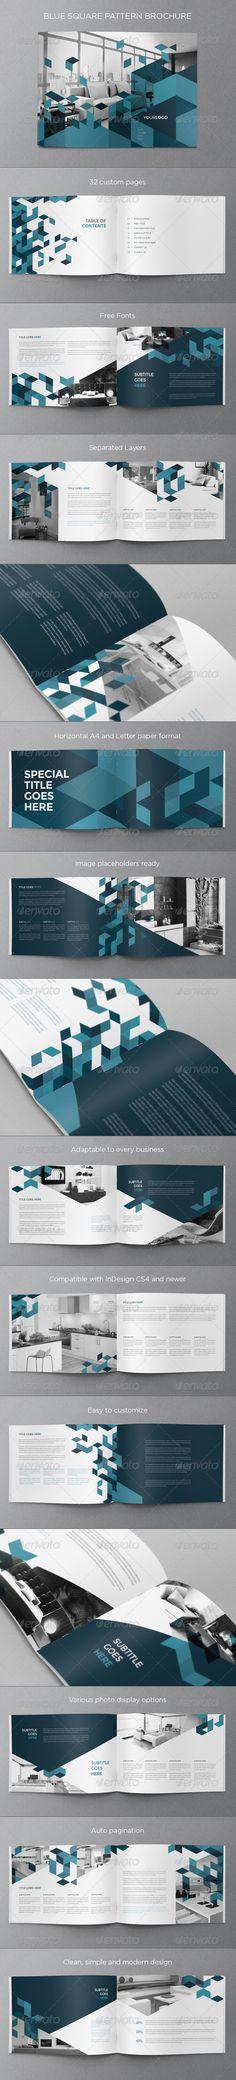 Blue Square Pattern Brochure - Brochures Print Templates